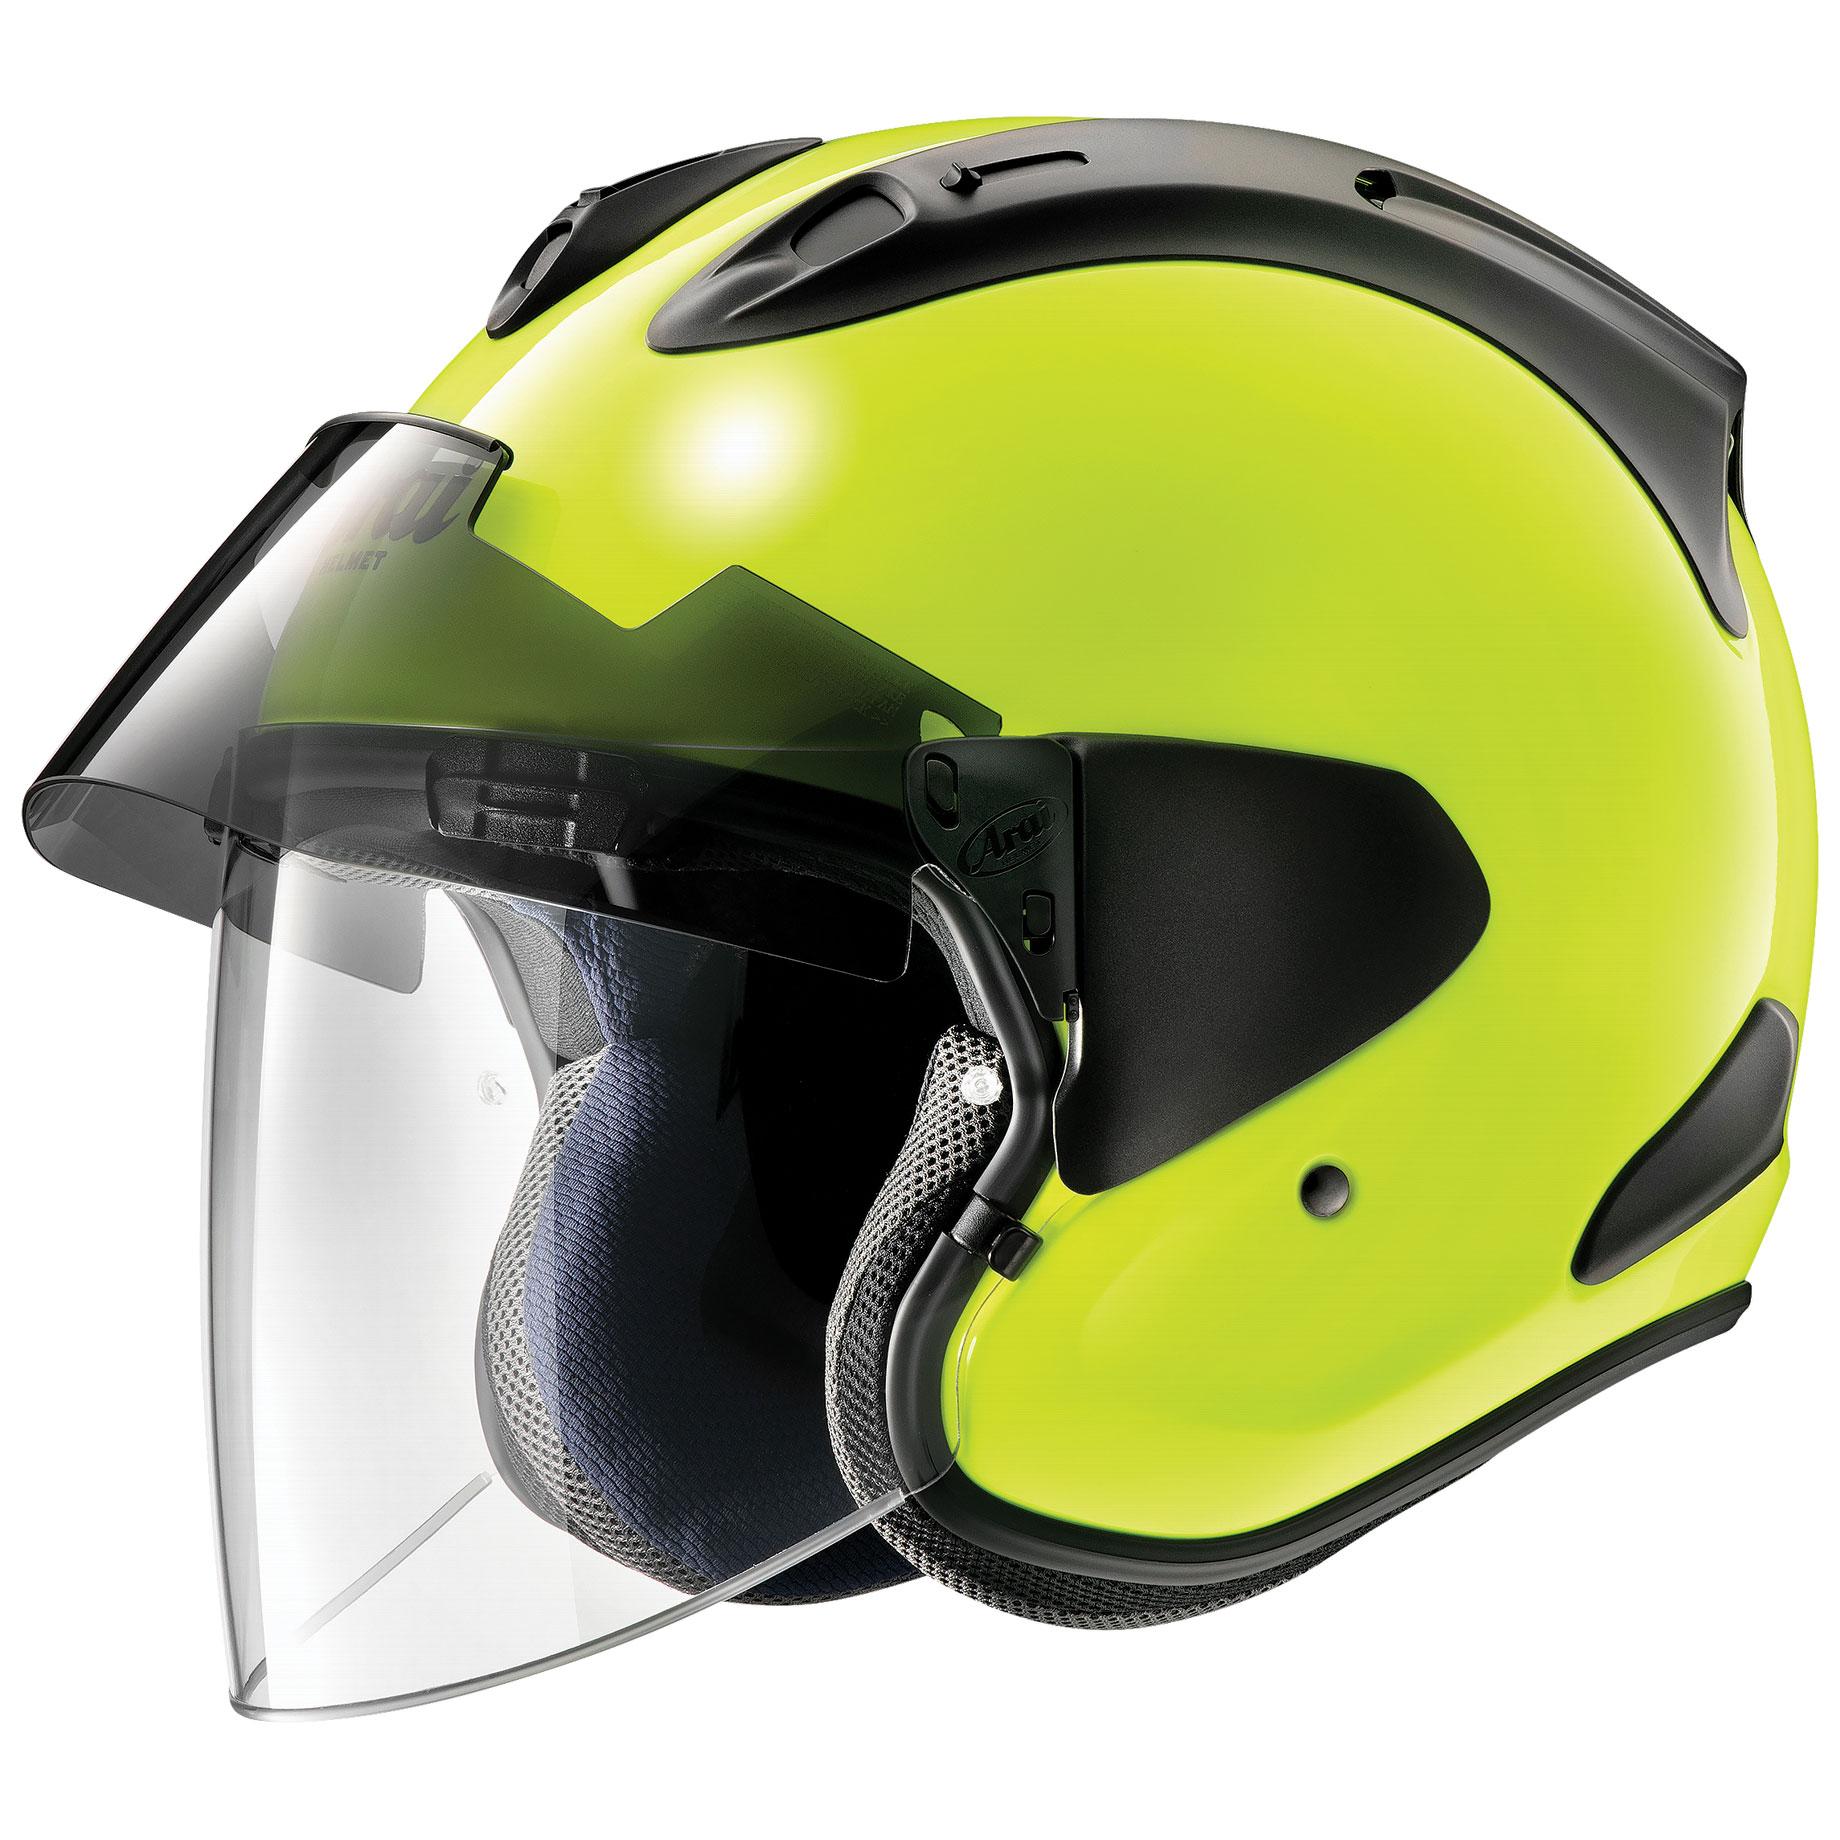 Arai Ram-X Flou Yellow Open Face Helmet - 685311163776